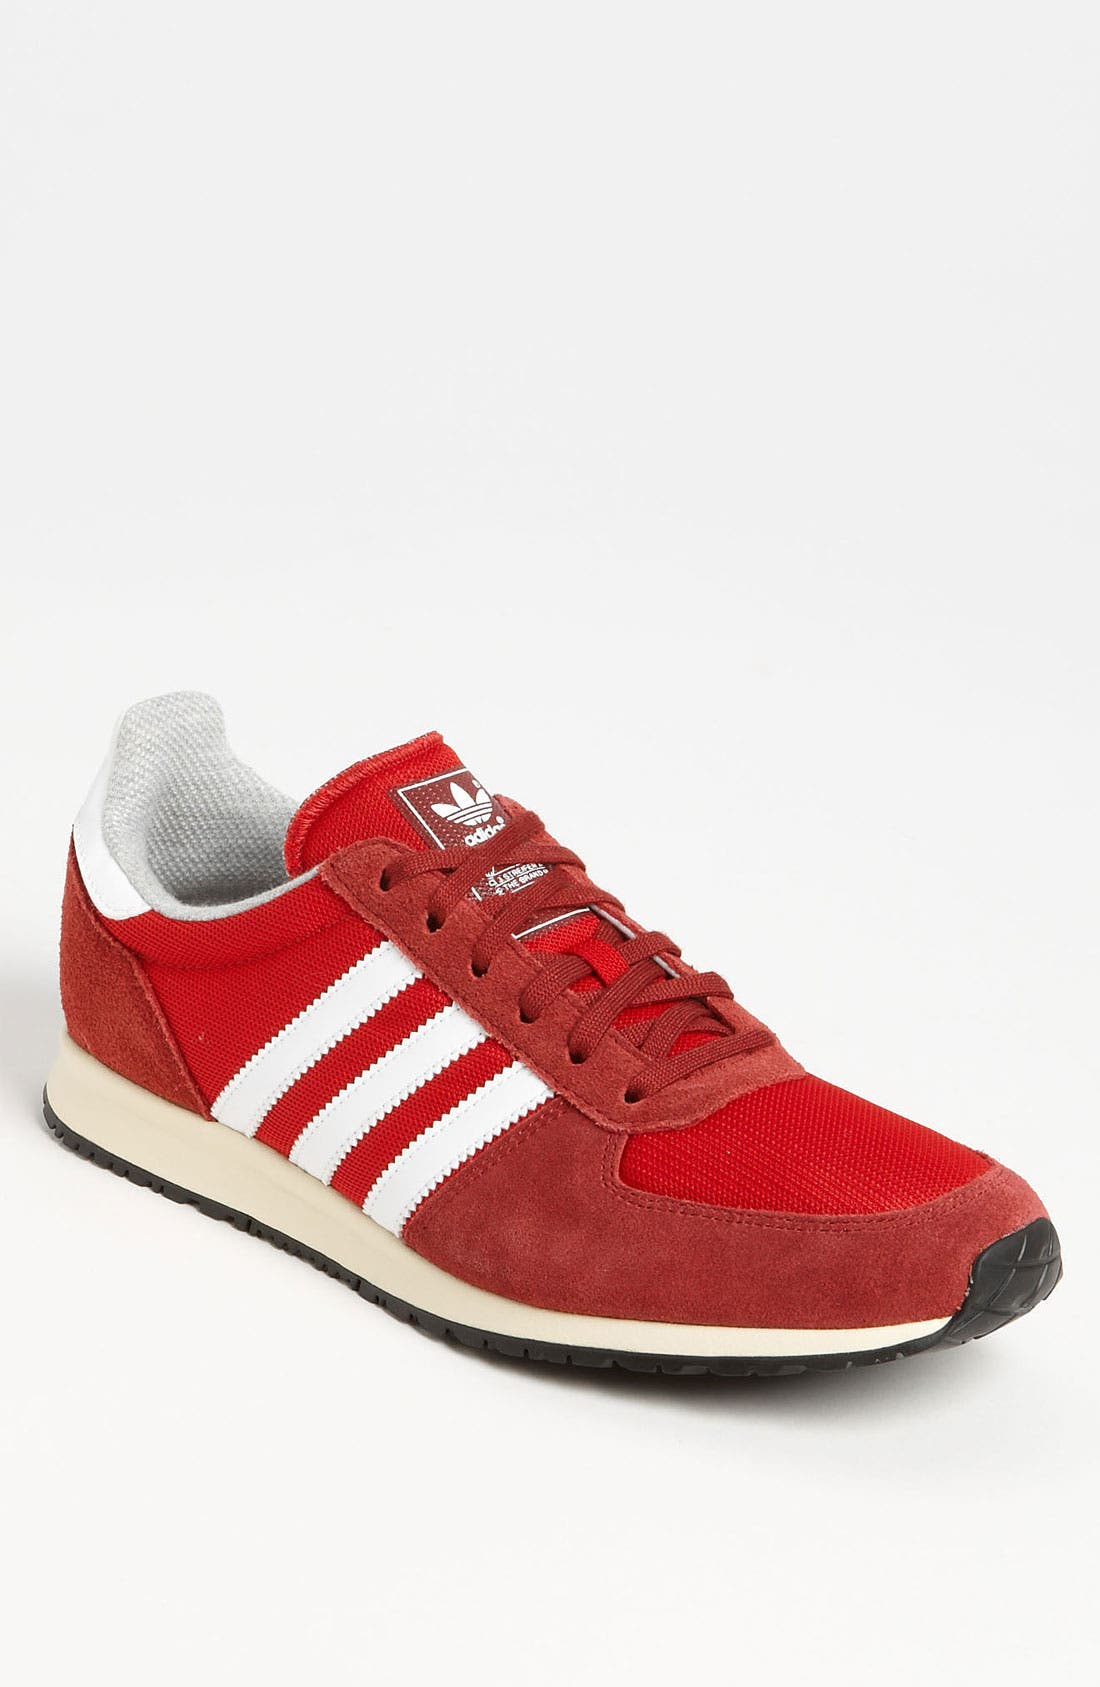 Alternate Image 1 Selected - adidas 'Adistar Racer' Sneaker (Men)